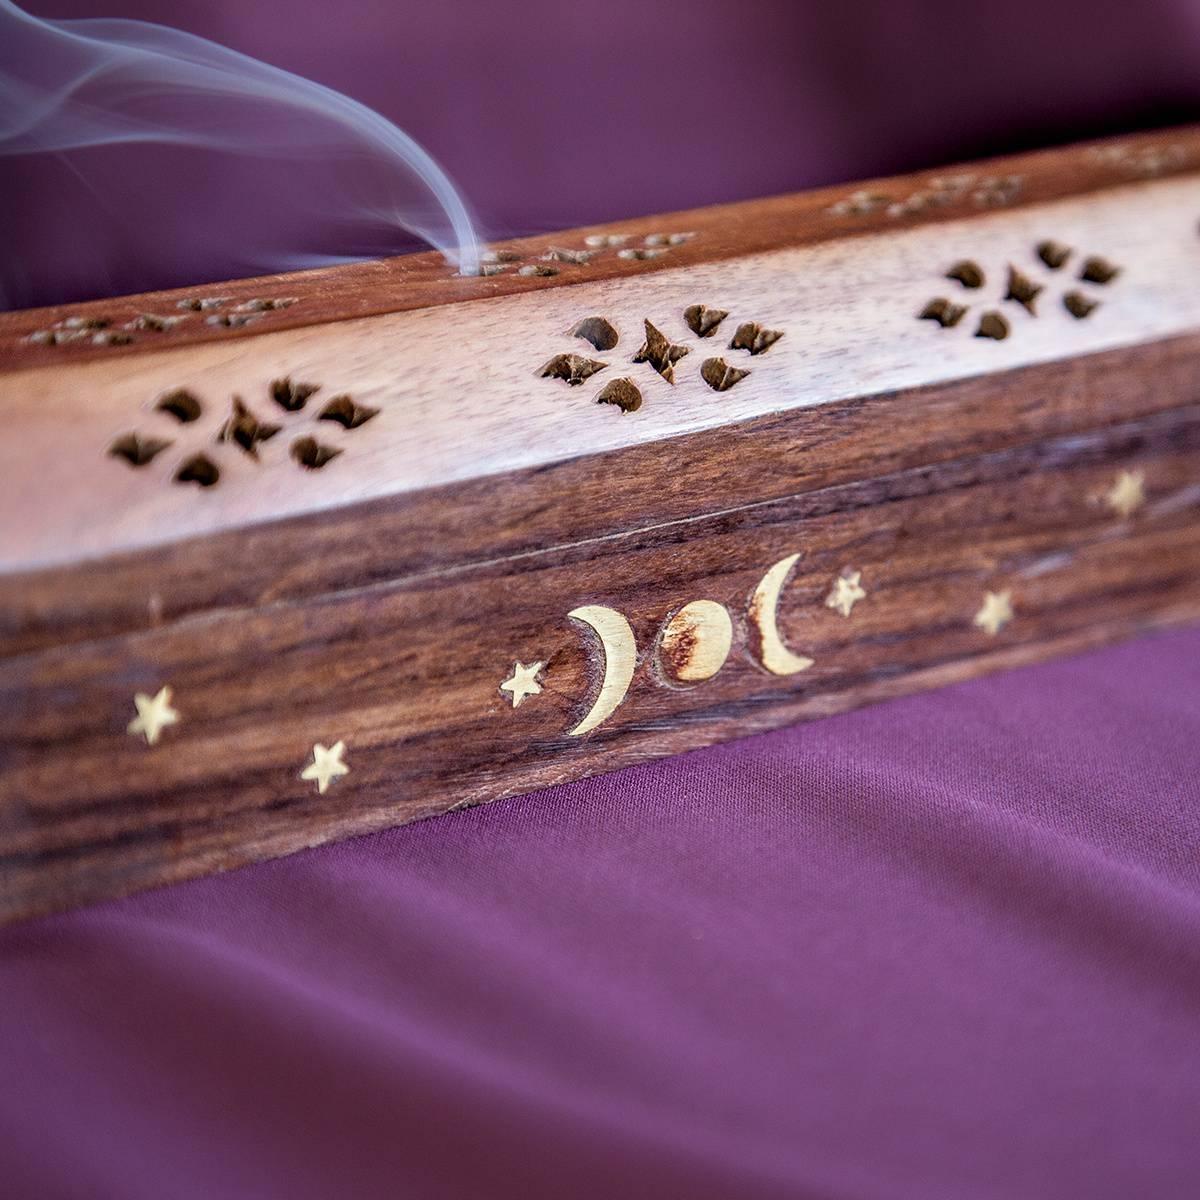 Wooden Moon Incense Burner Box Detail